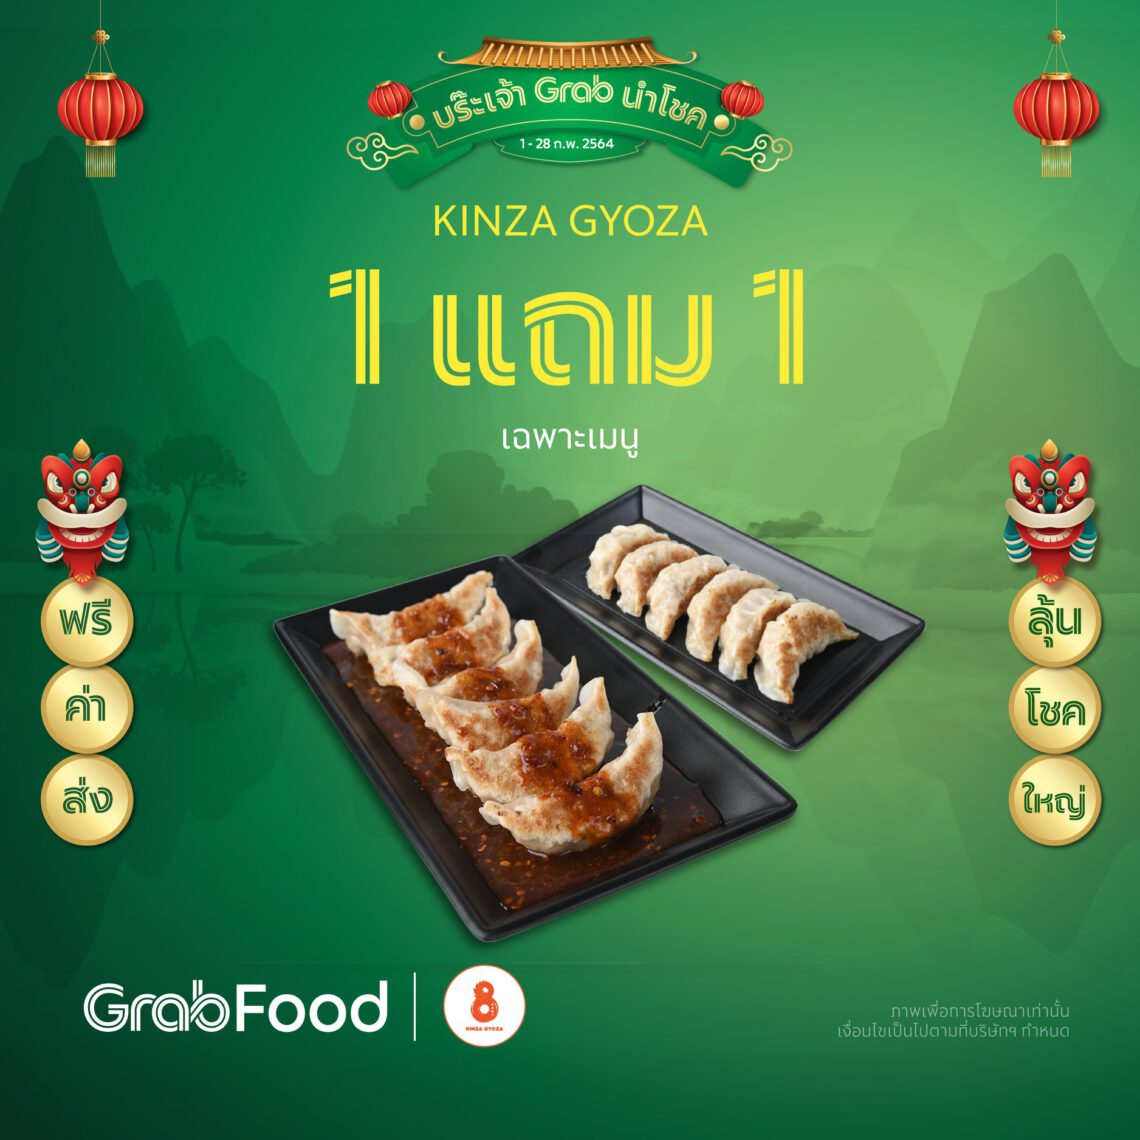 Grabfood โปรตรุษจีน 2564